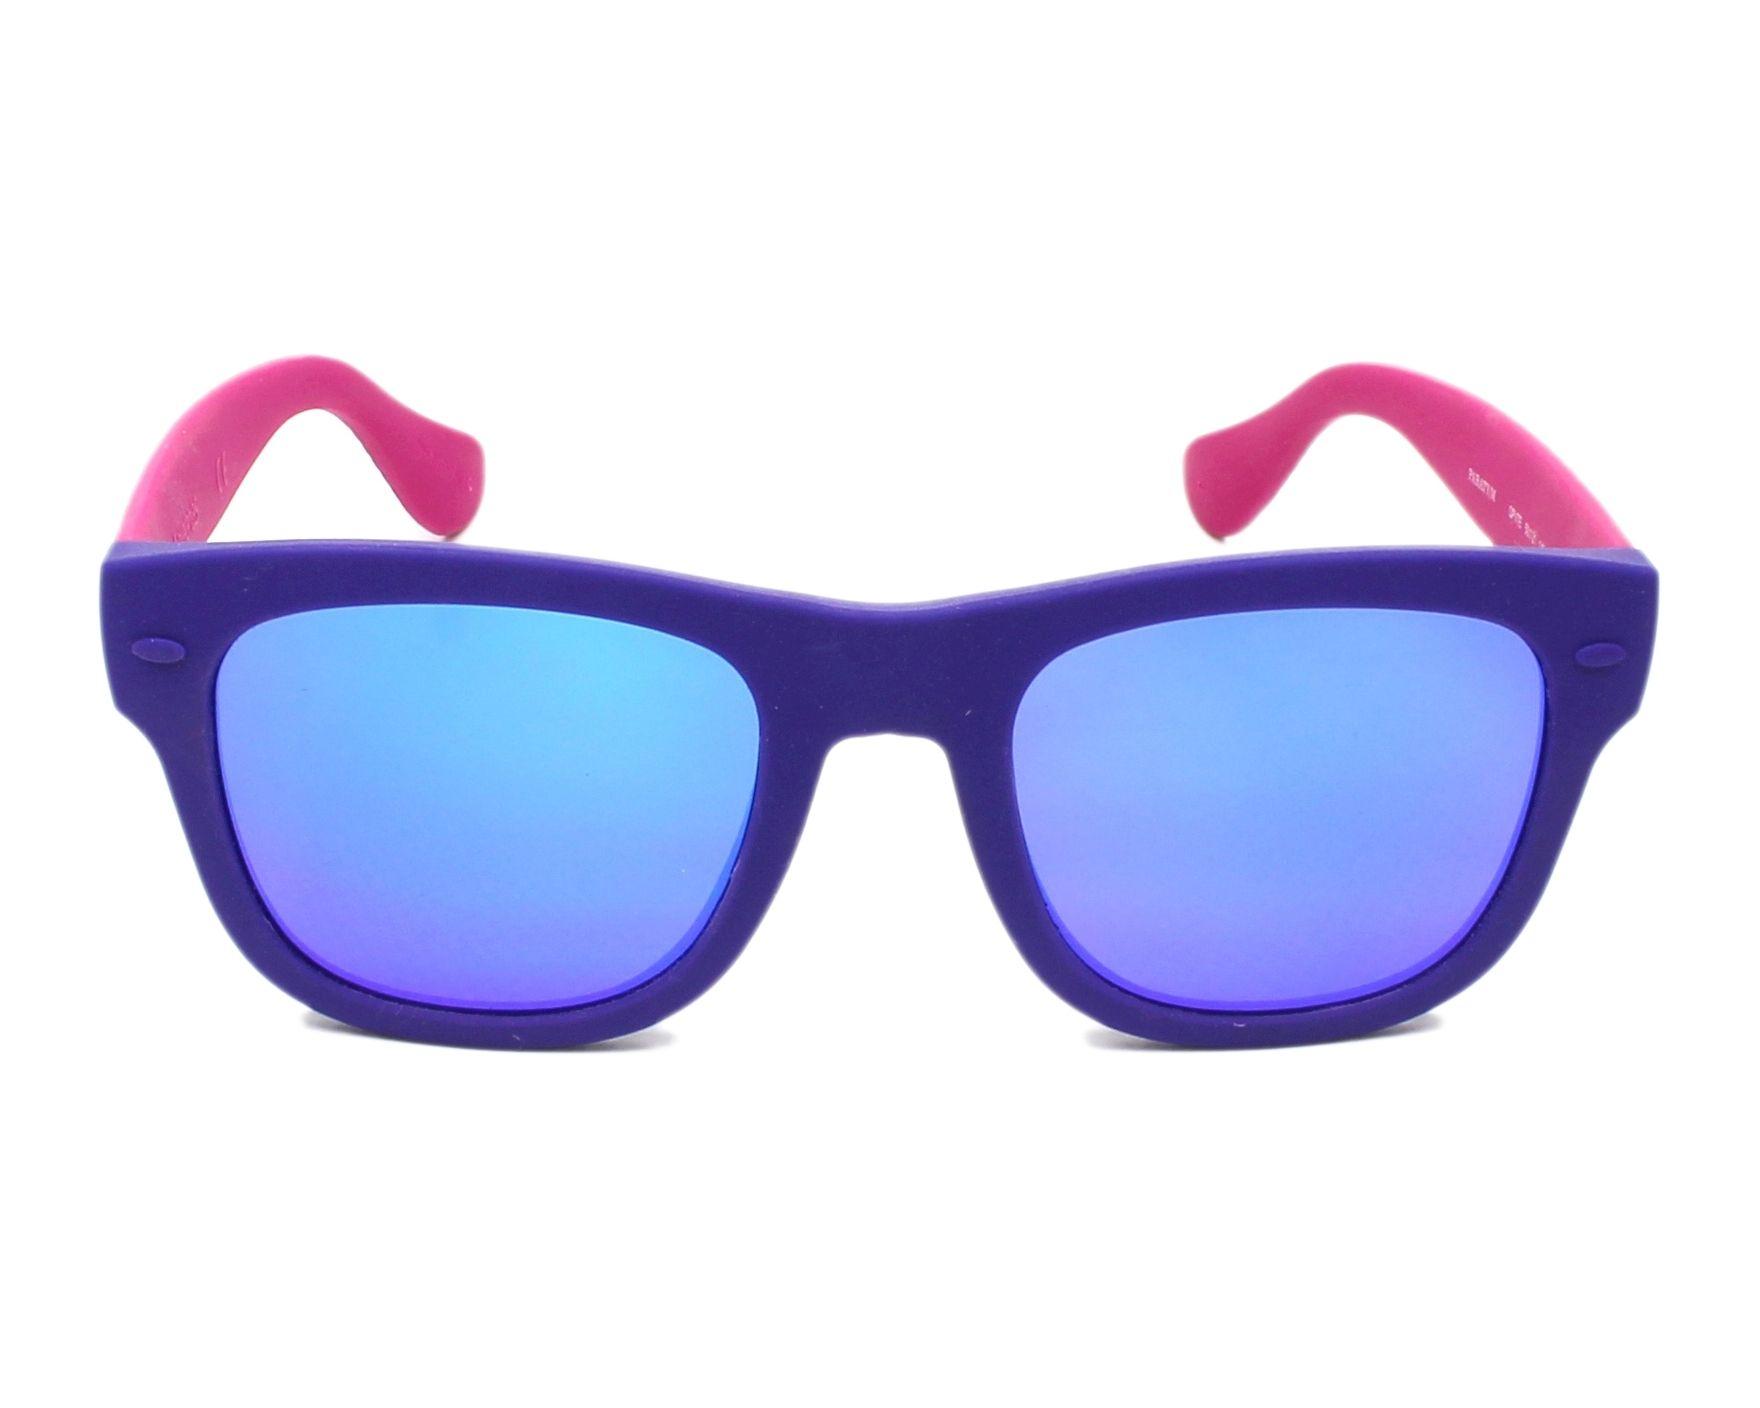 Havaianas Sunglasses Paraty M Qpv Te Purple Visionet